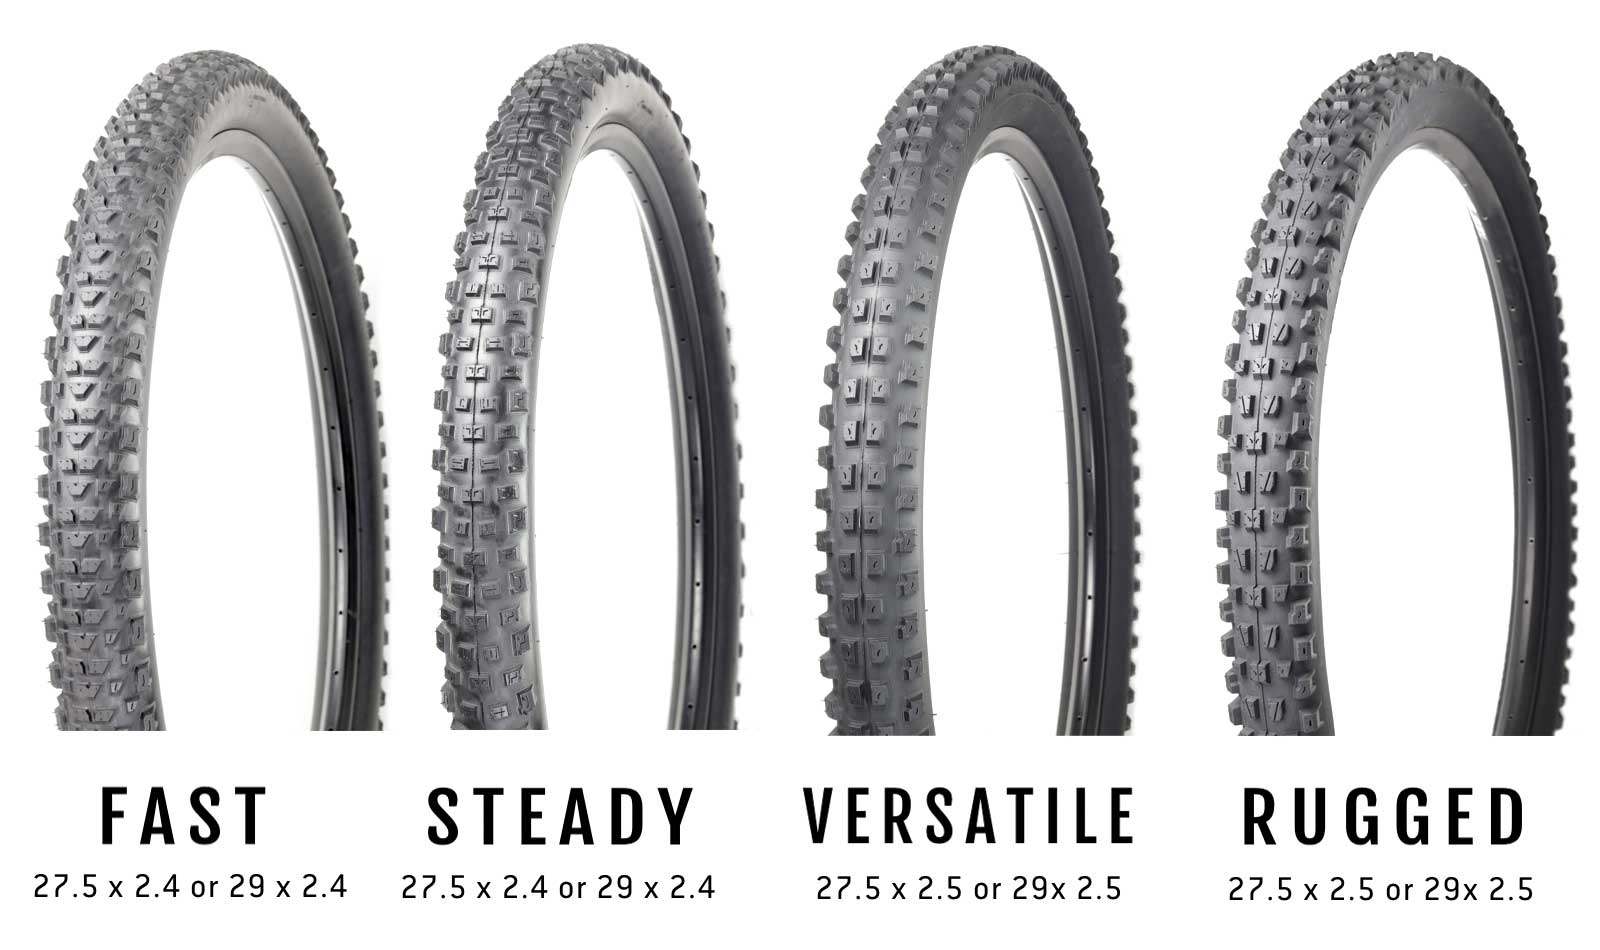 delium rugged versatile steady fast mtb tire range affordable